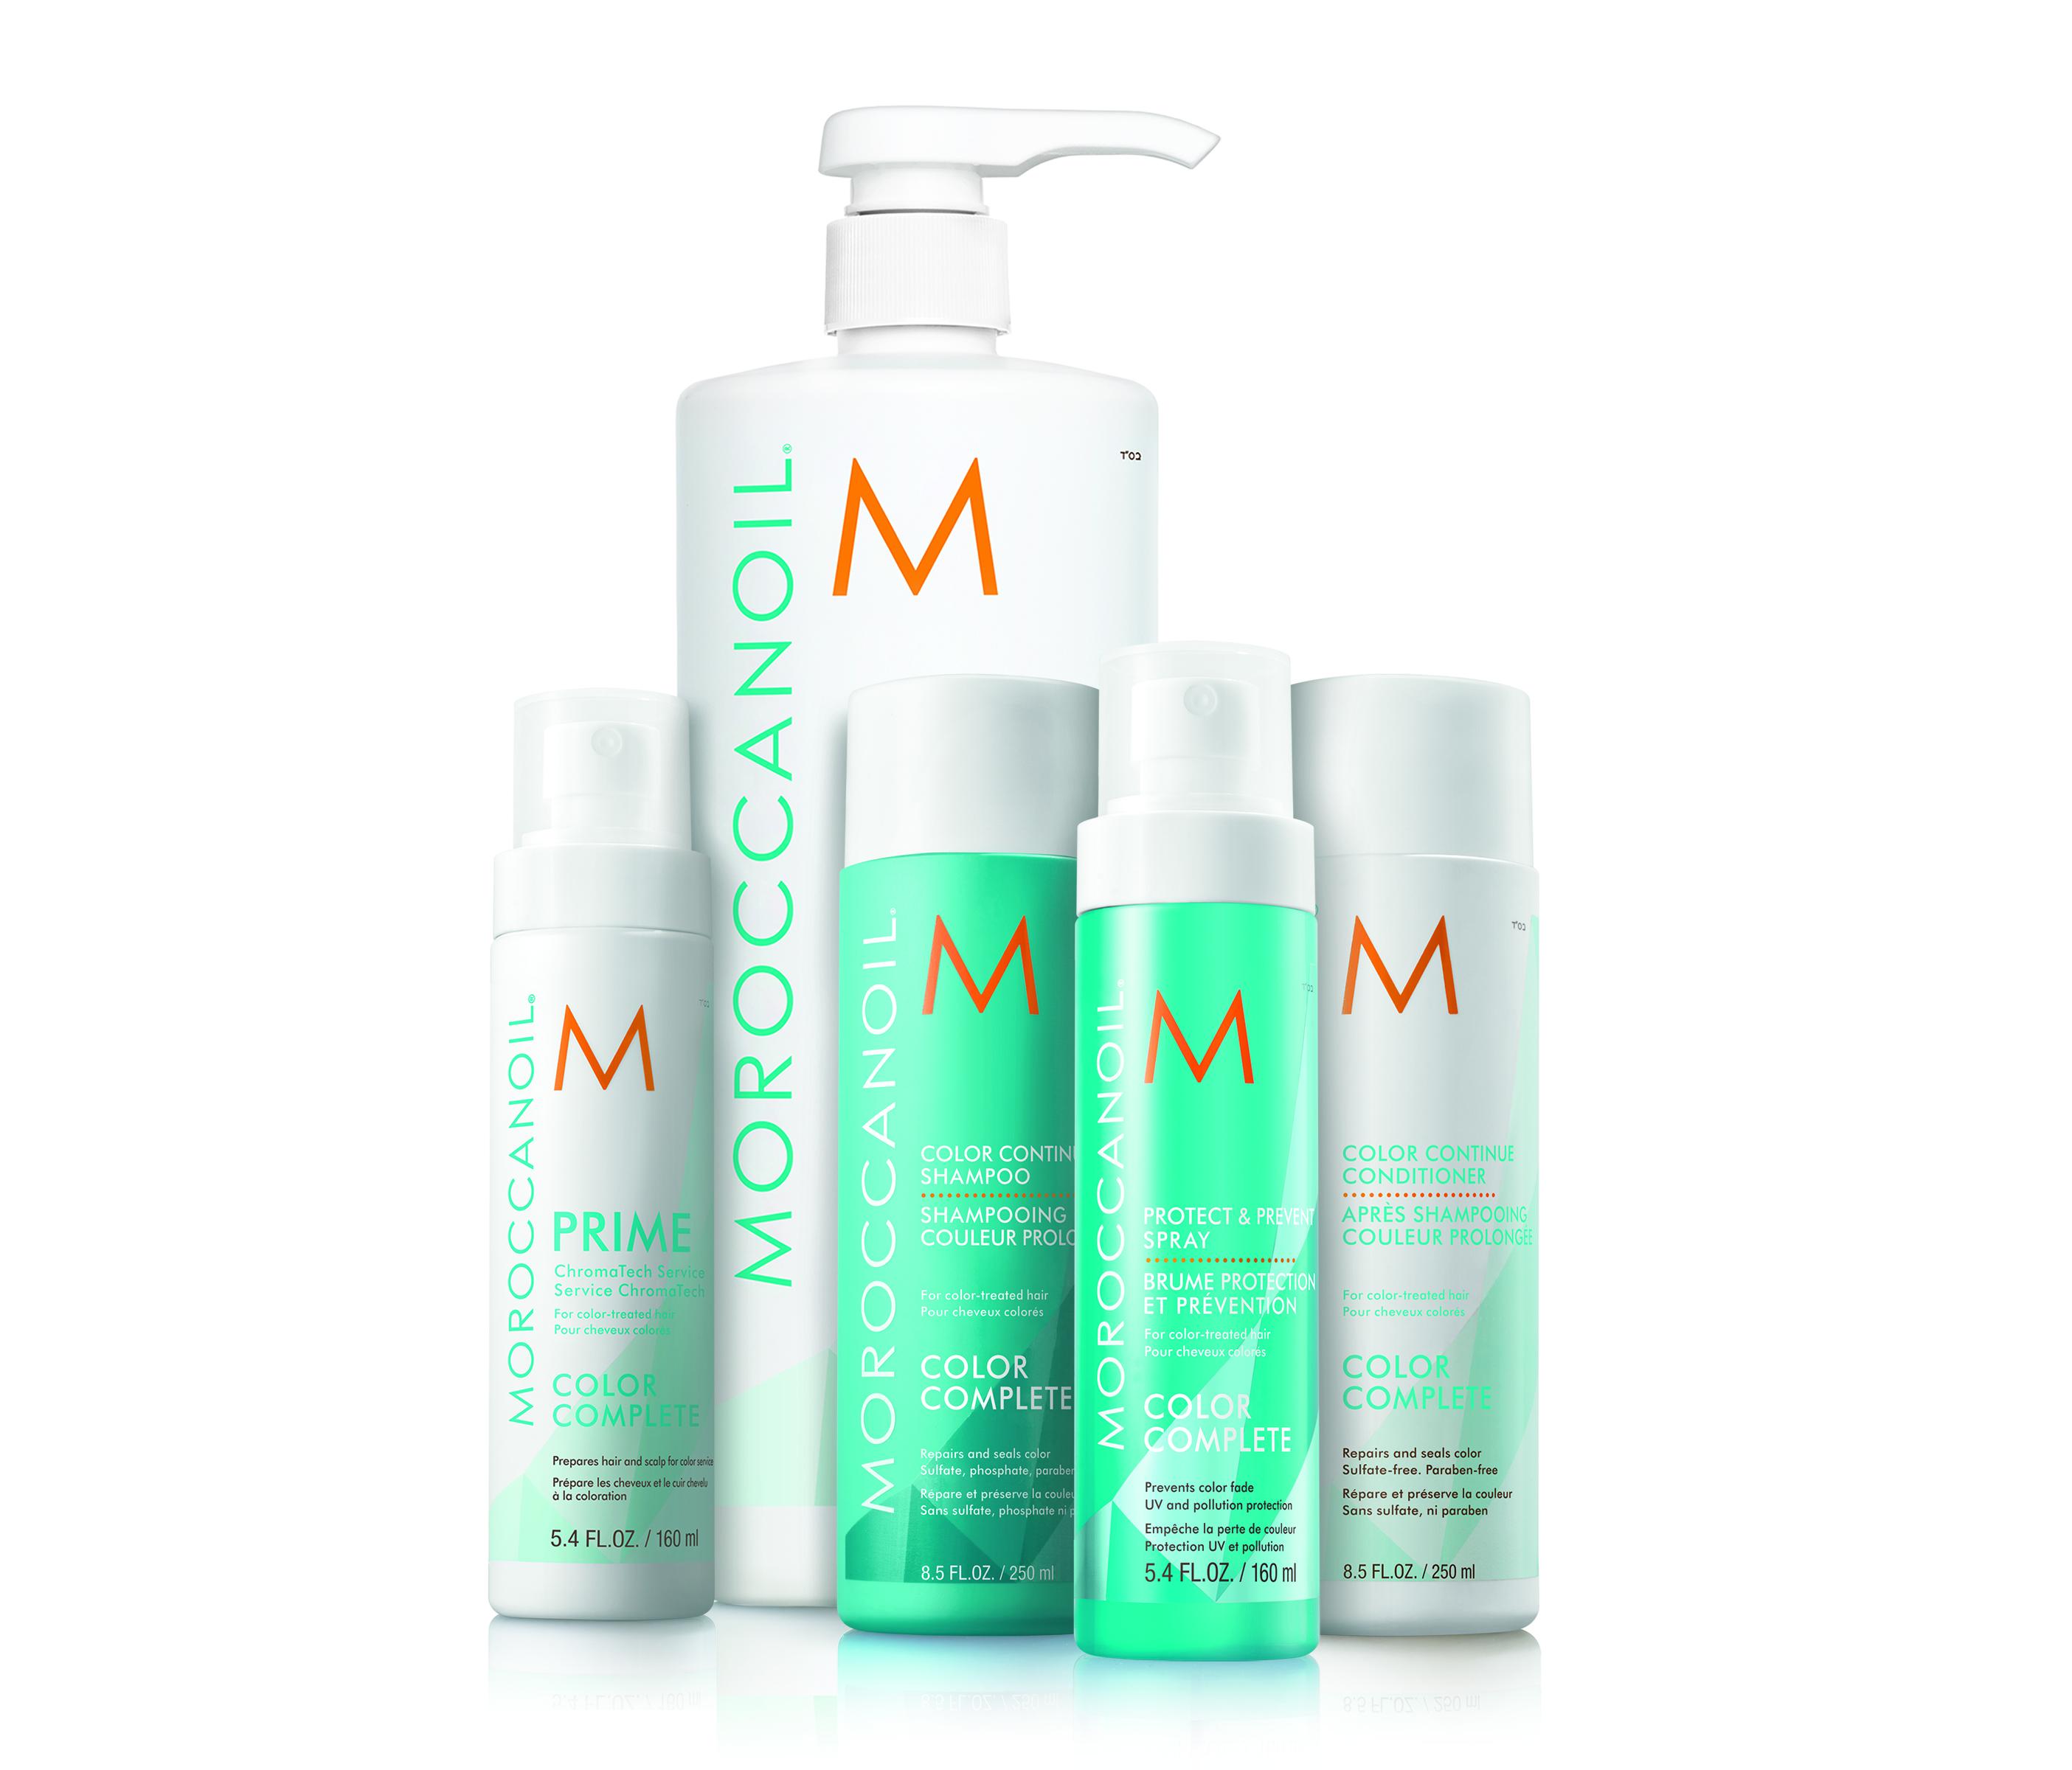 Moroccanoil Announces Color Complete Collection